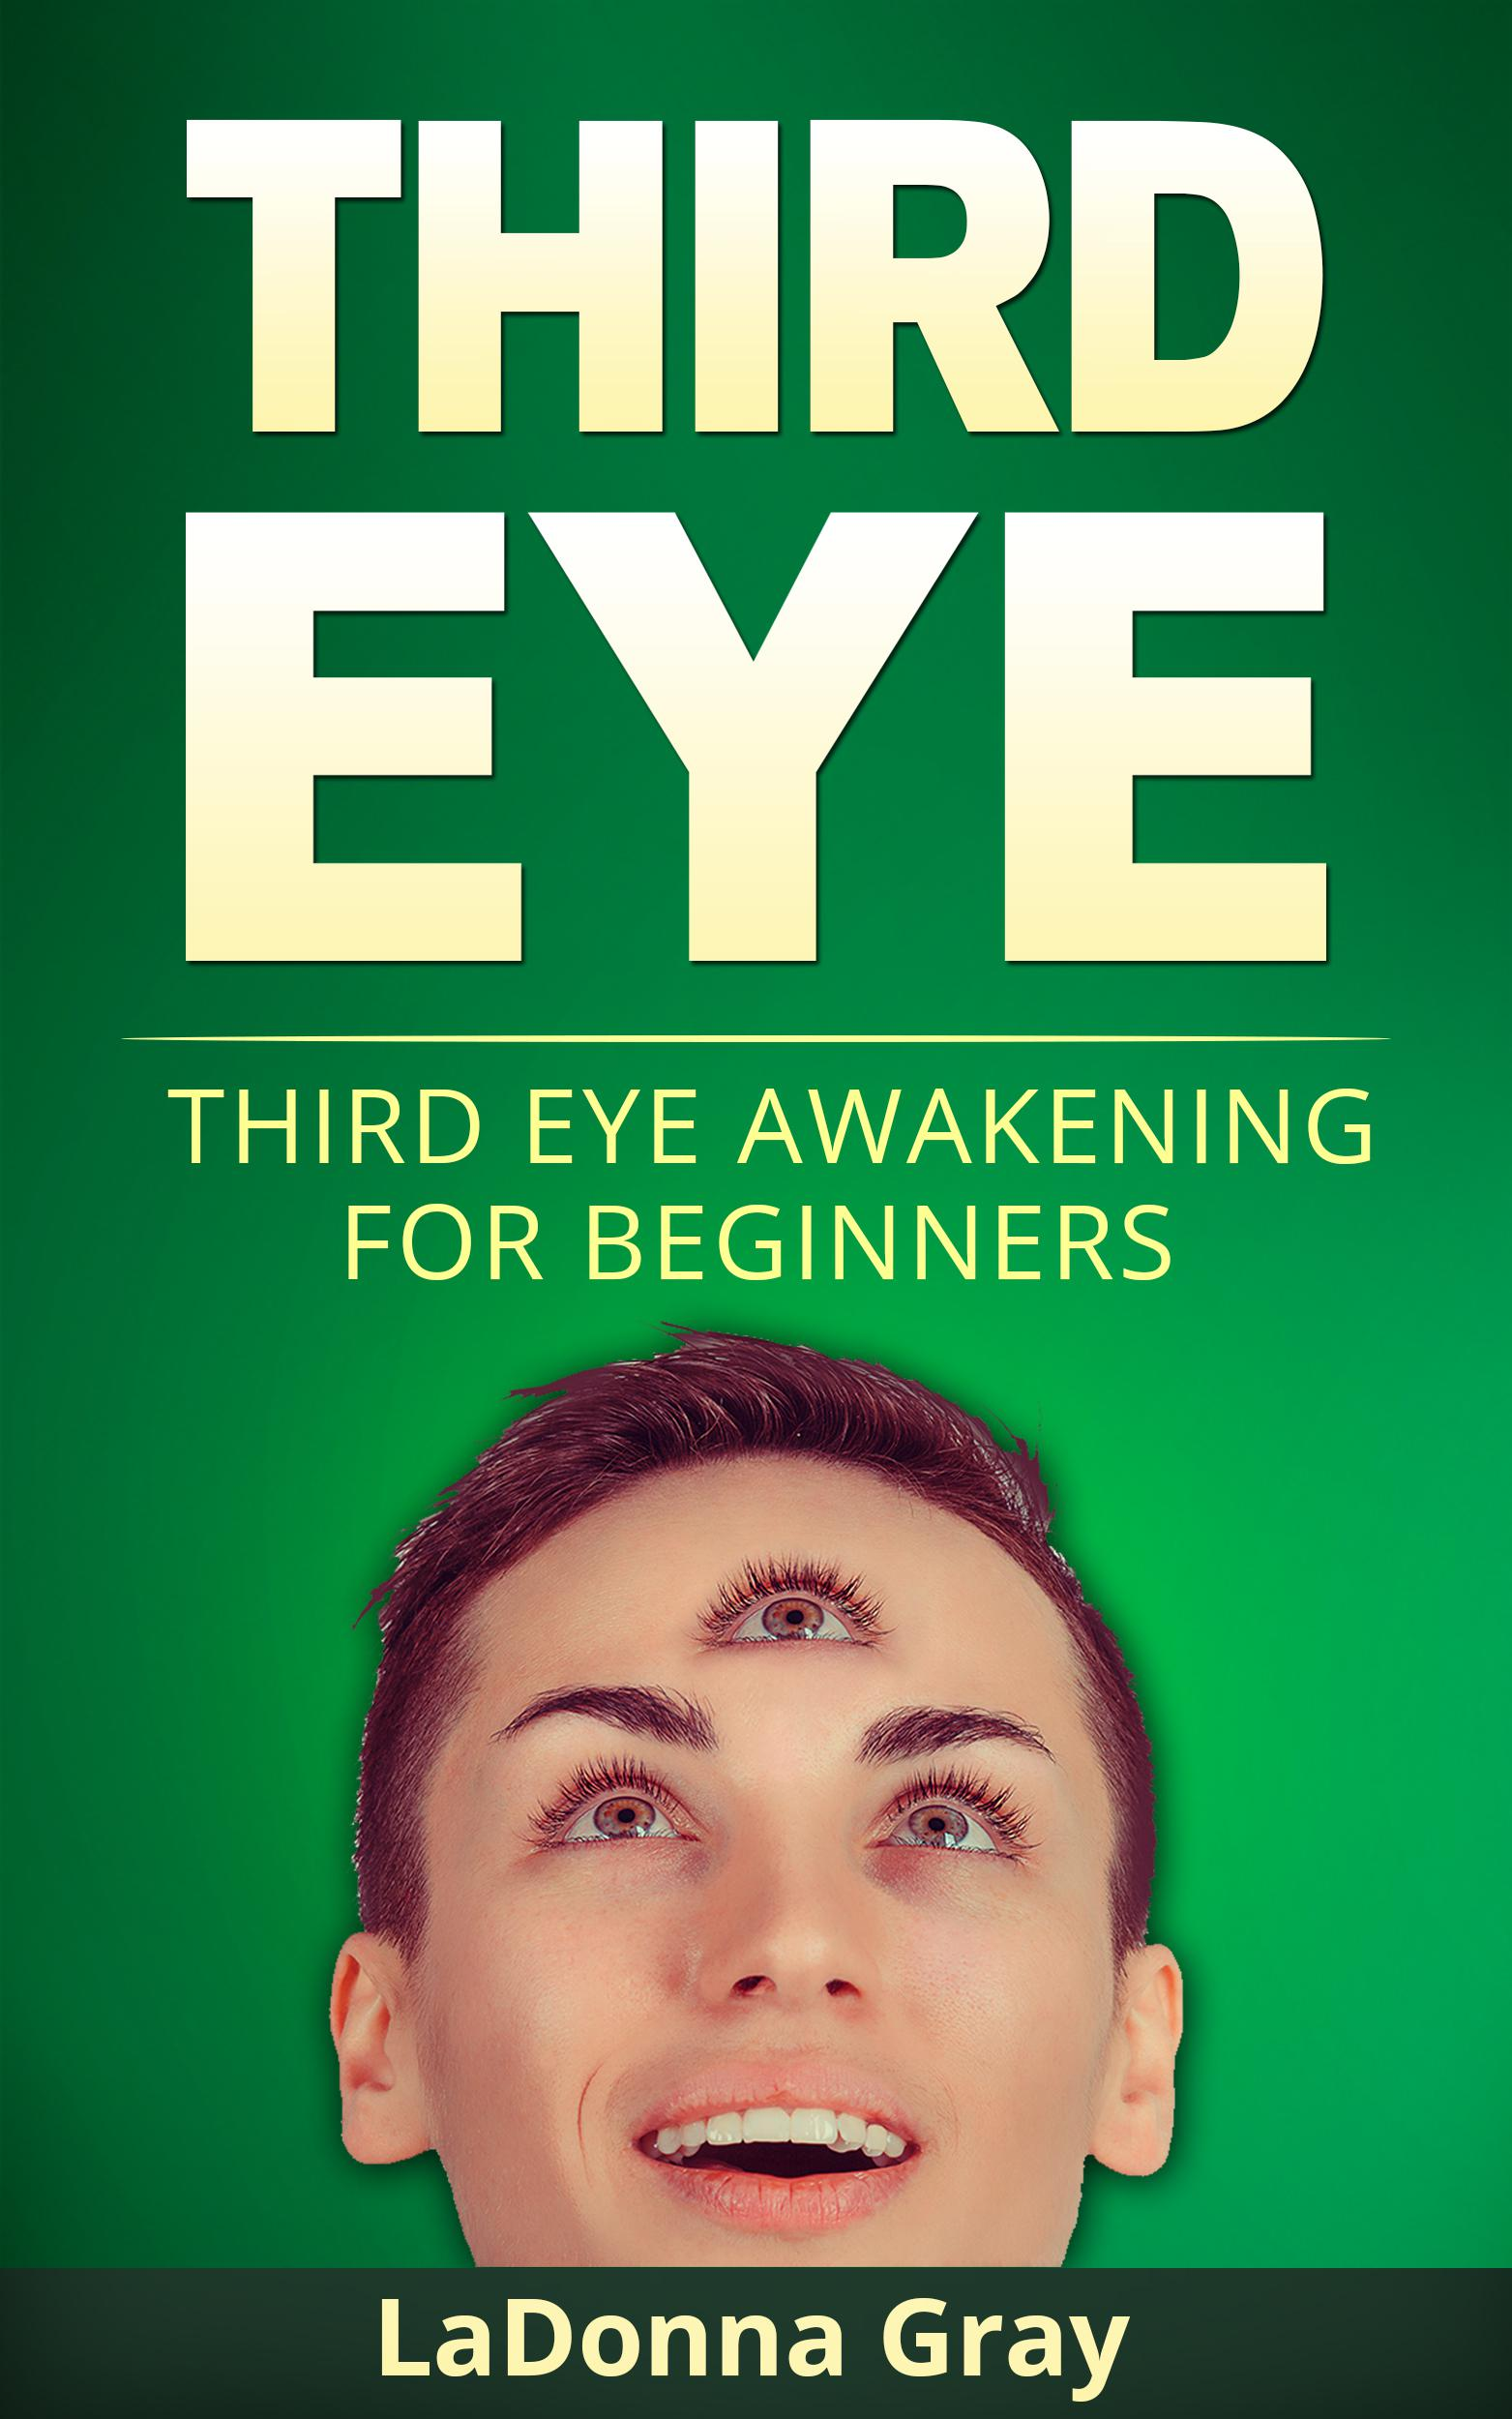 Third Eye Awakening for Beginners, an Ebook by Ladonna Gray